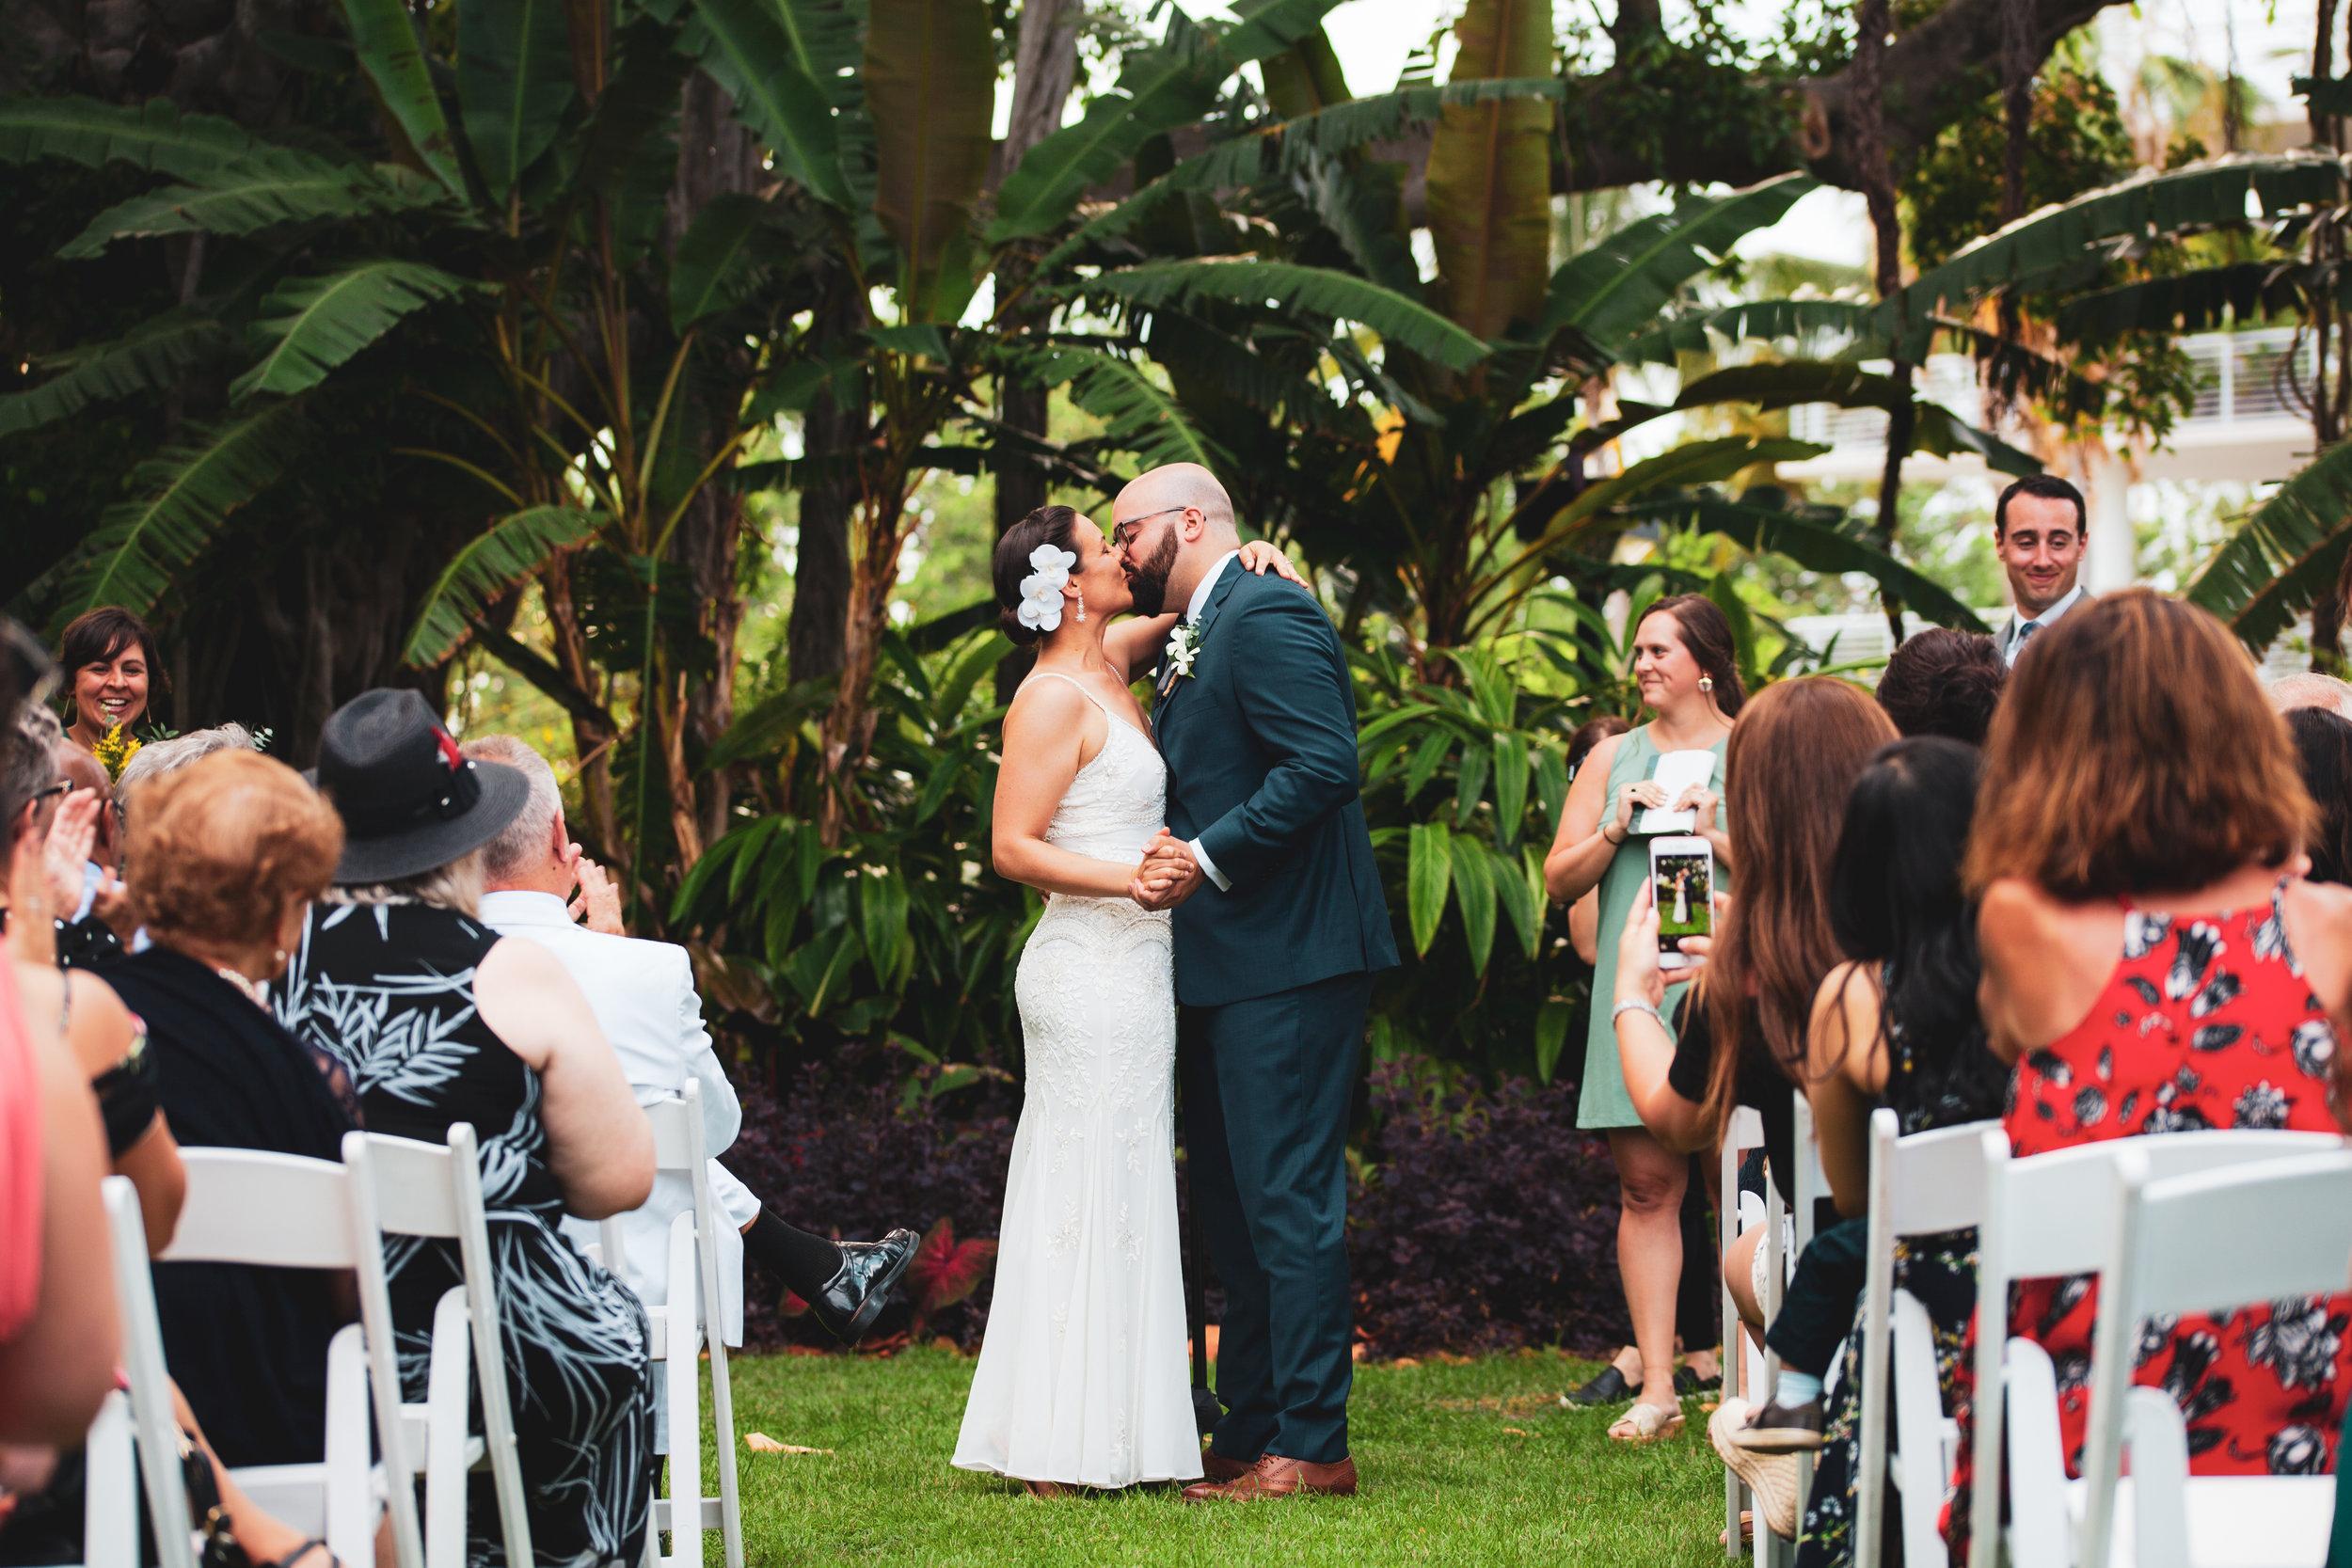 miami beach botanical garden florida wedding © kelilina photography 20190601123138-5.jpg